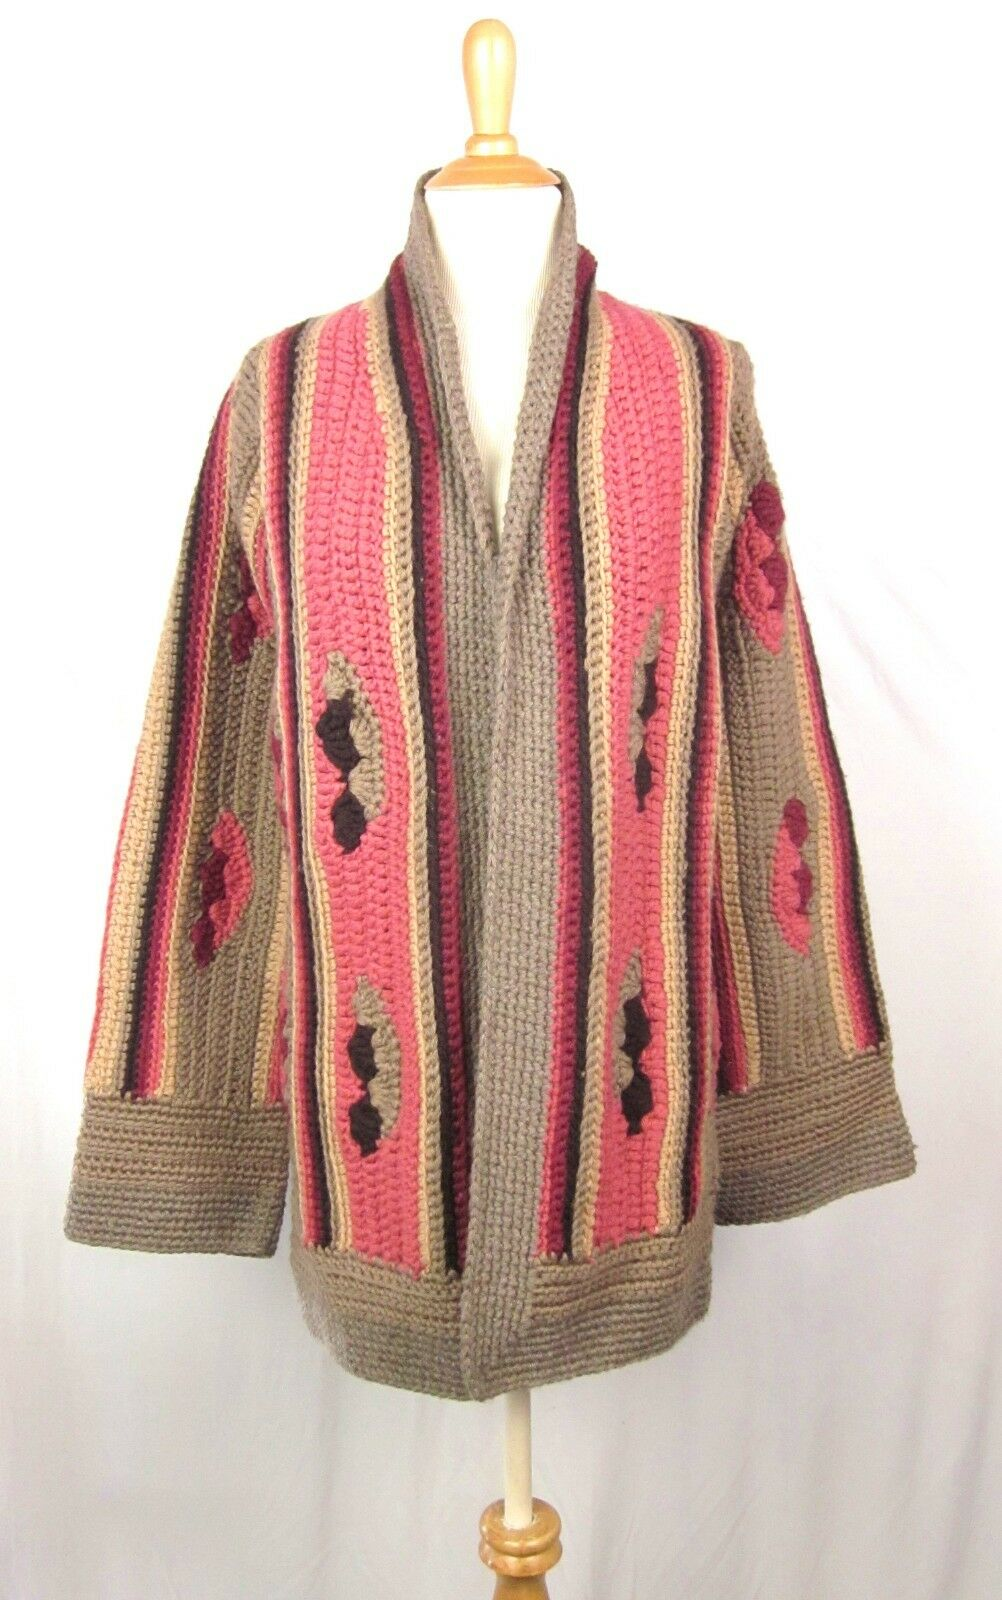 Katayone Adeli Crochet Cardigan Sweater Coat S Wool Vintage 90s Pink Brown Boho